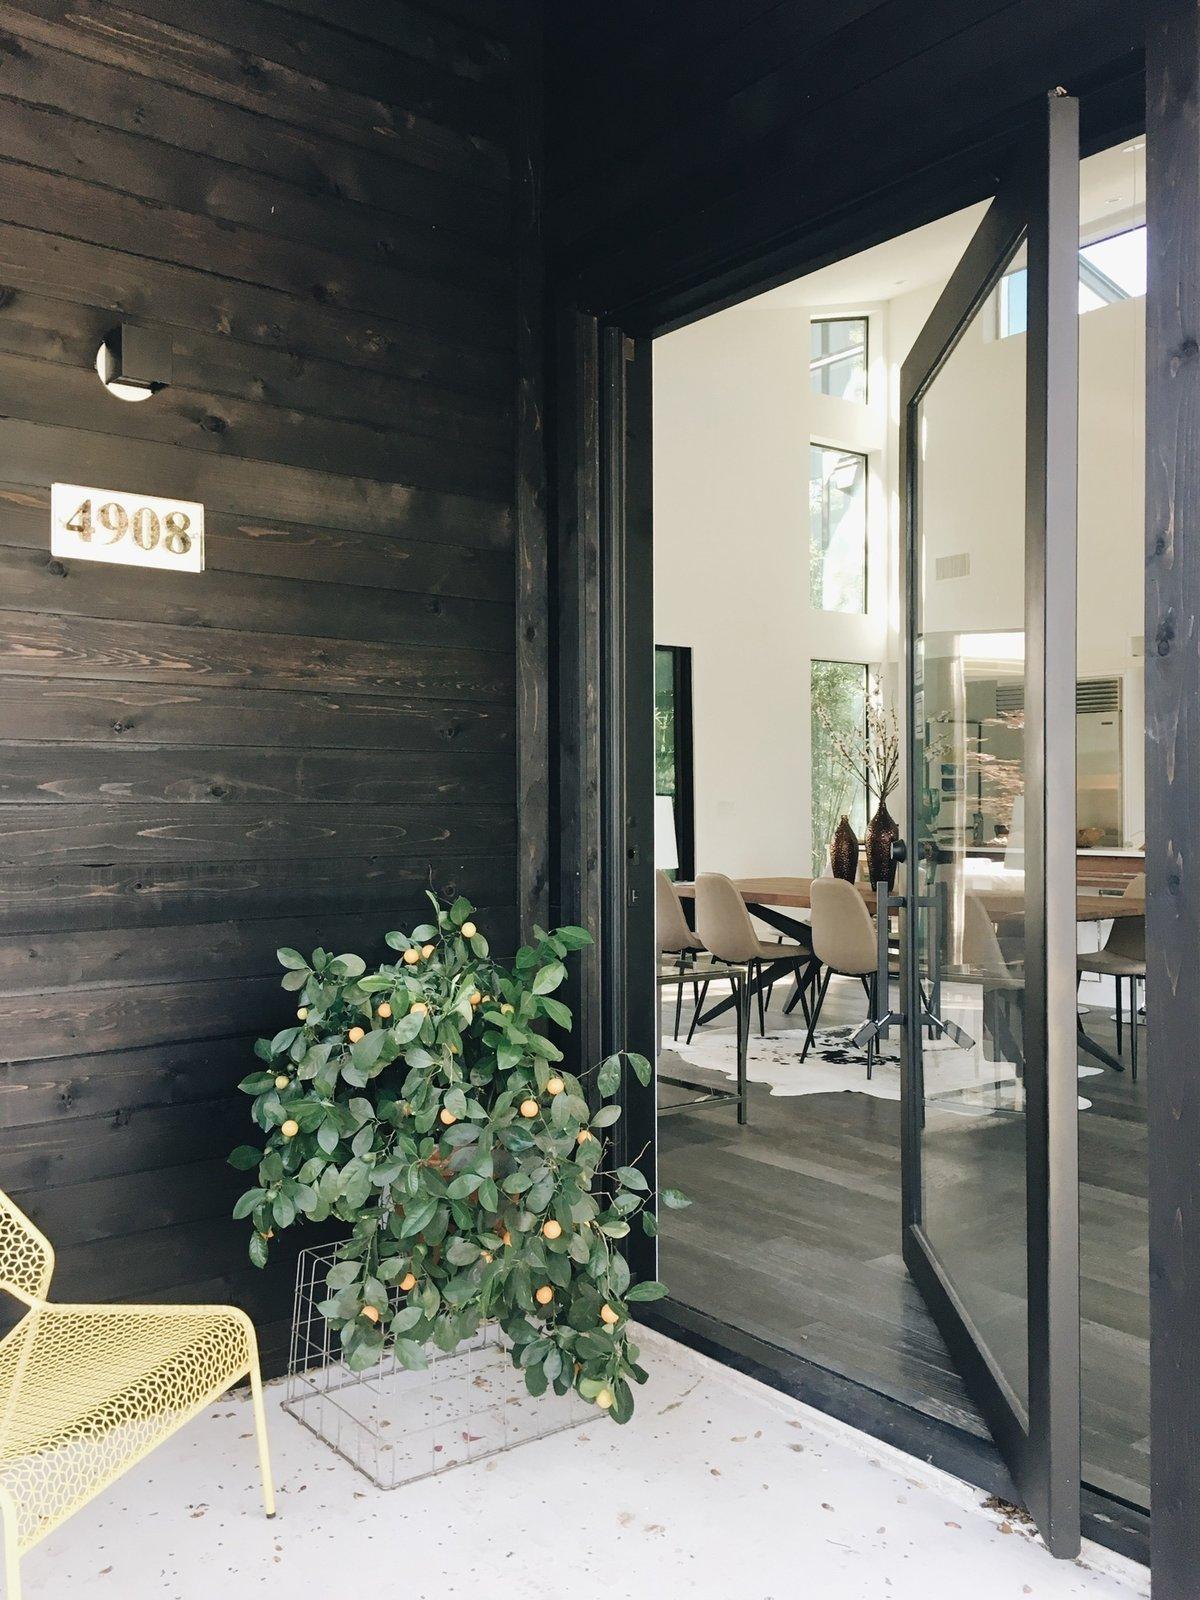 Strass Residence by Matt Fajkus Architecture | Photography: Anna Katsios  Strass Residence